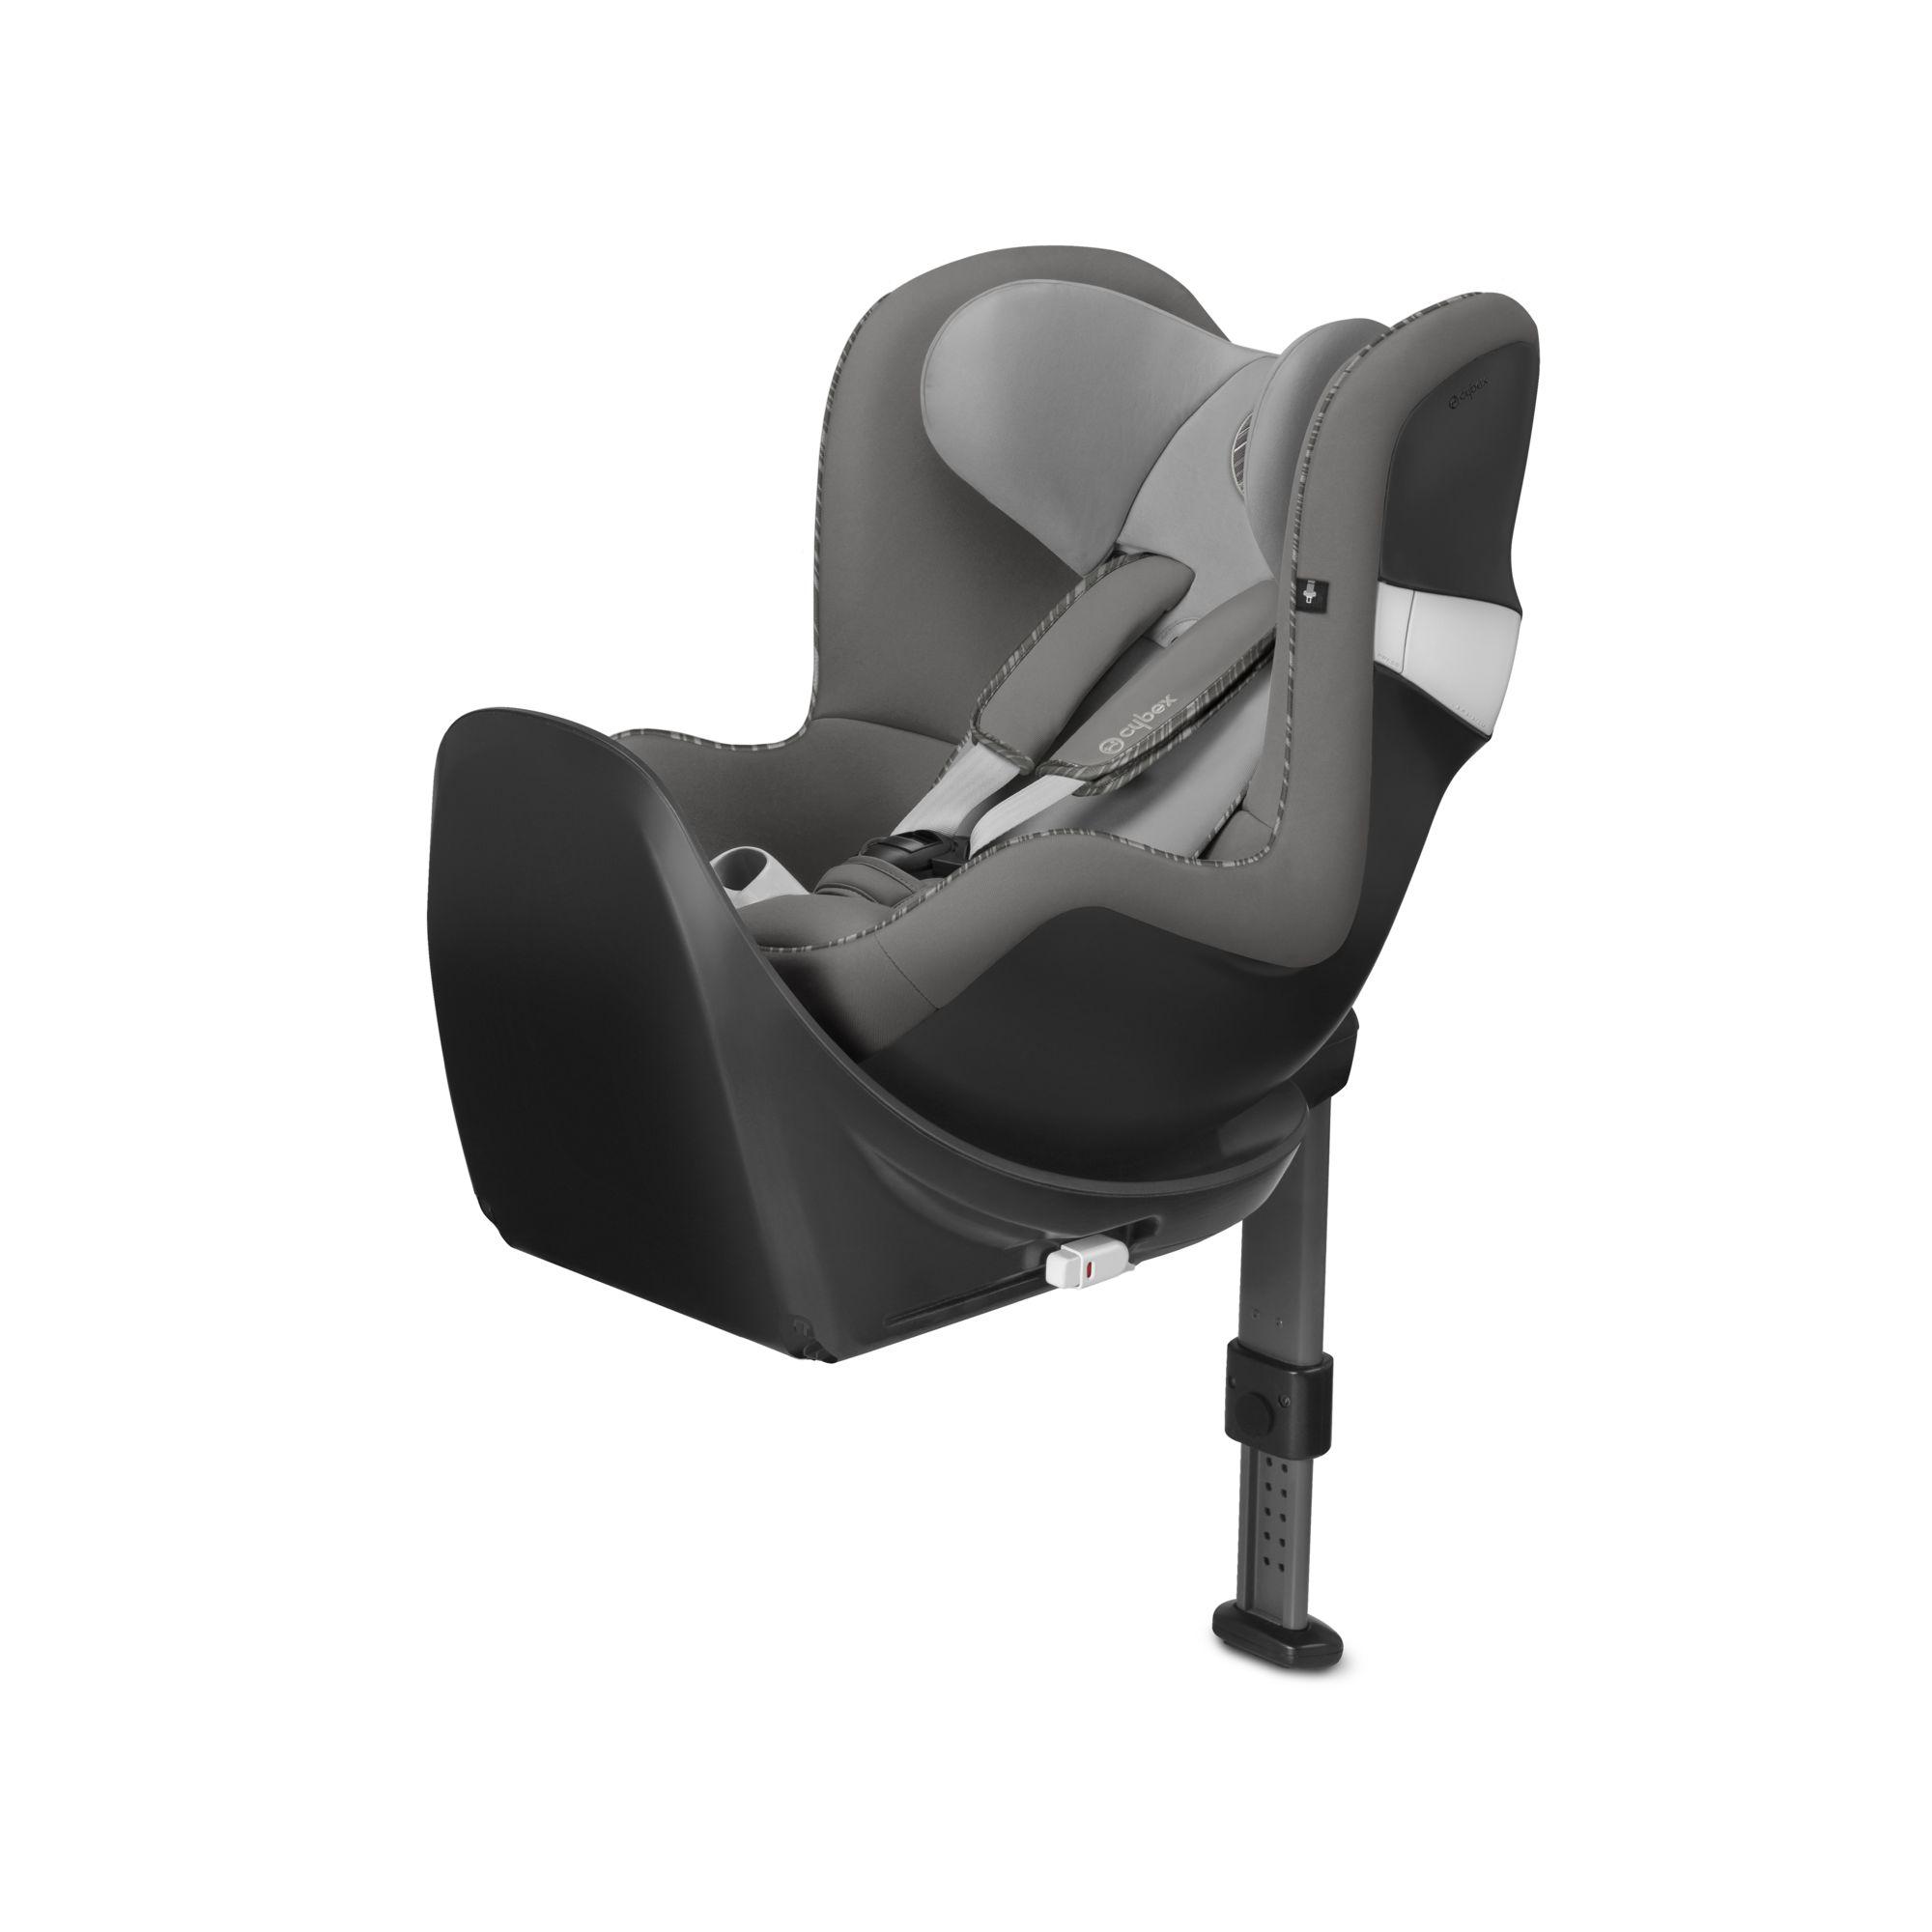 sirona m2 i size reboardkindersitz die kindersitzprofis. Black Bedroom Furniture Sets. Home Design Ideas